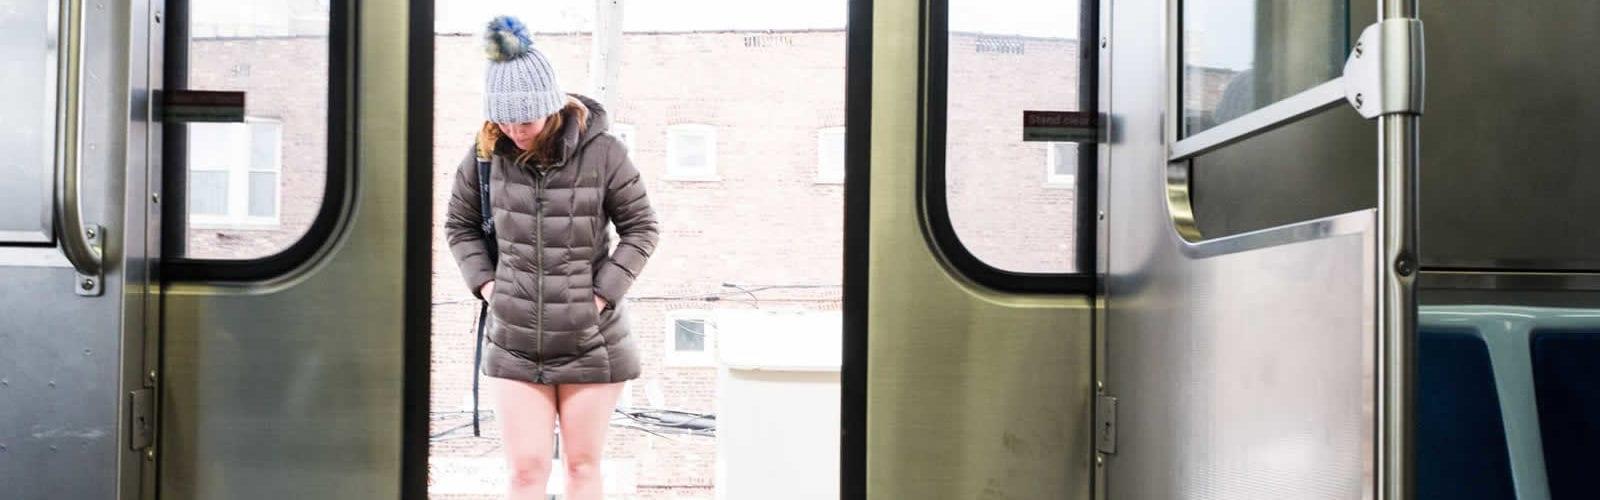 no-pants-subway-ride-sans-pantalon-metro-une